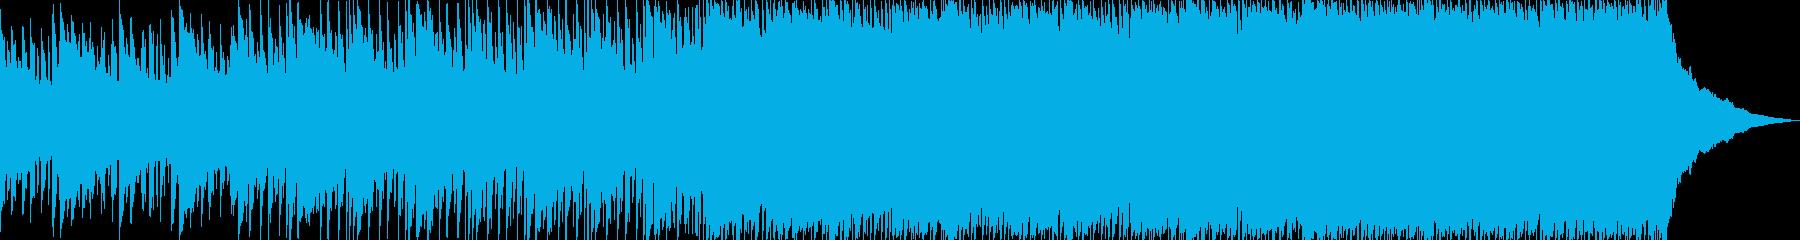 Earthboundの再生済みの波形